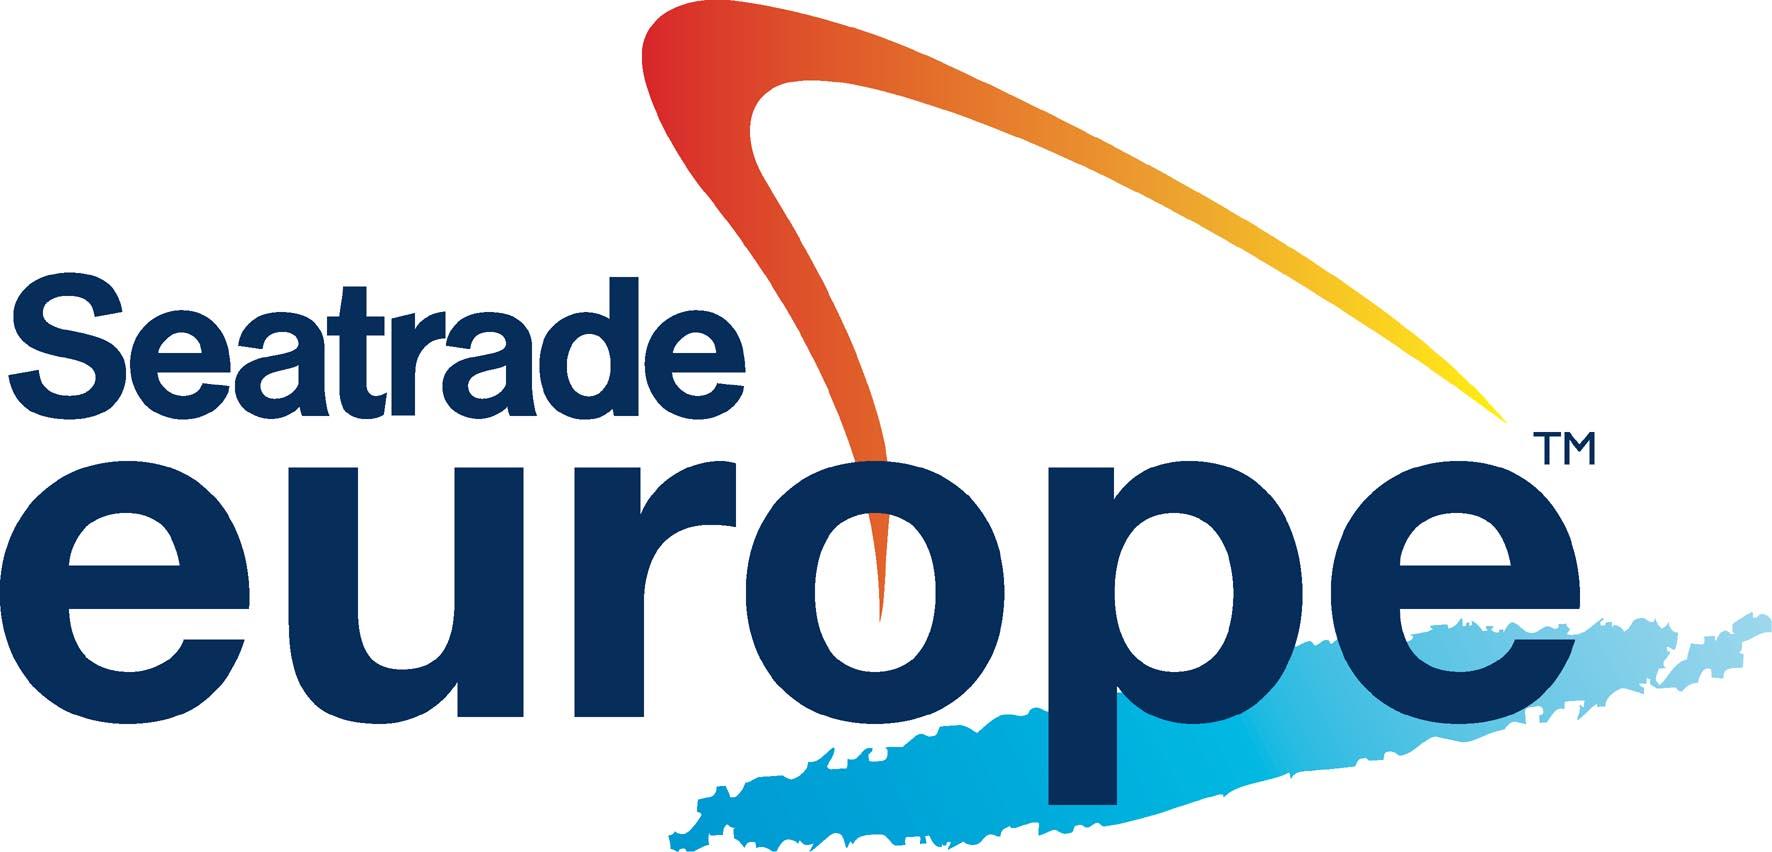 Seatrade Europe 2019